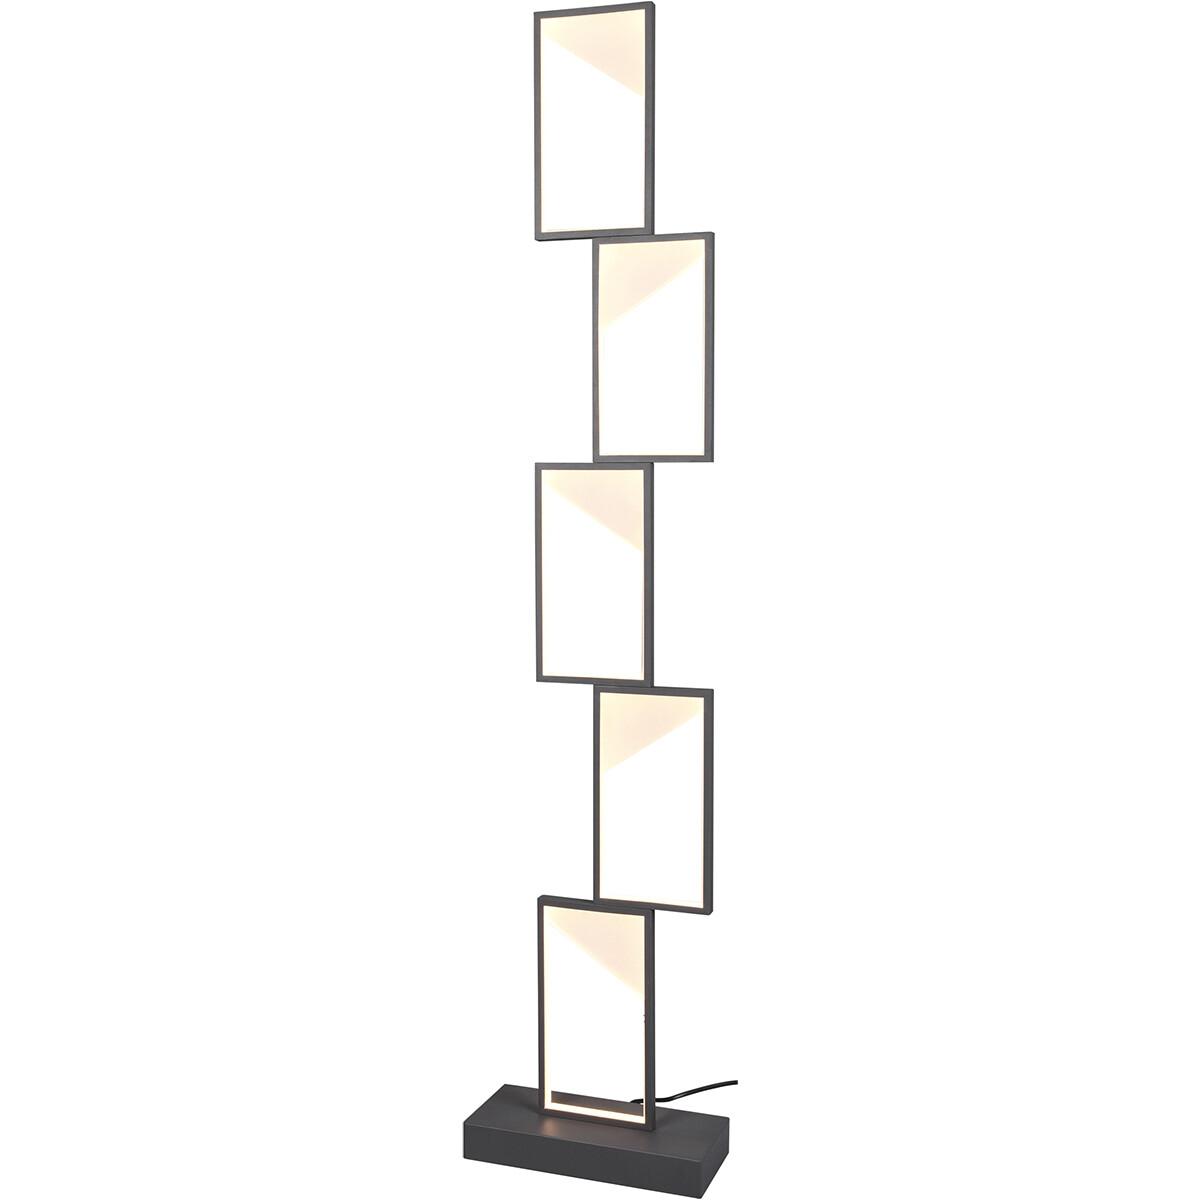 LED Vloerlamp - Trion Civa - 33W - Warm Wit 3000K - Dimbaar - Rechthoek - Mat Zwart - Aluminium